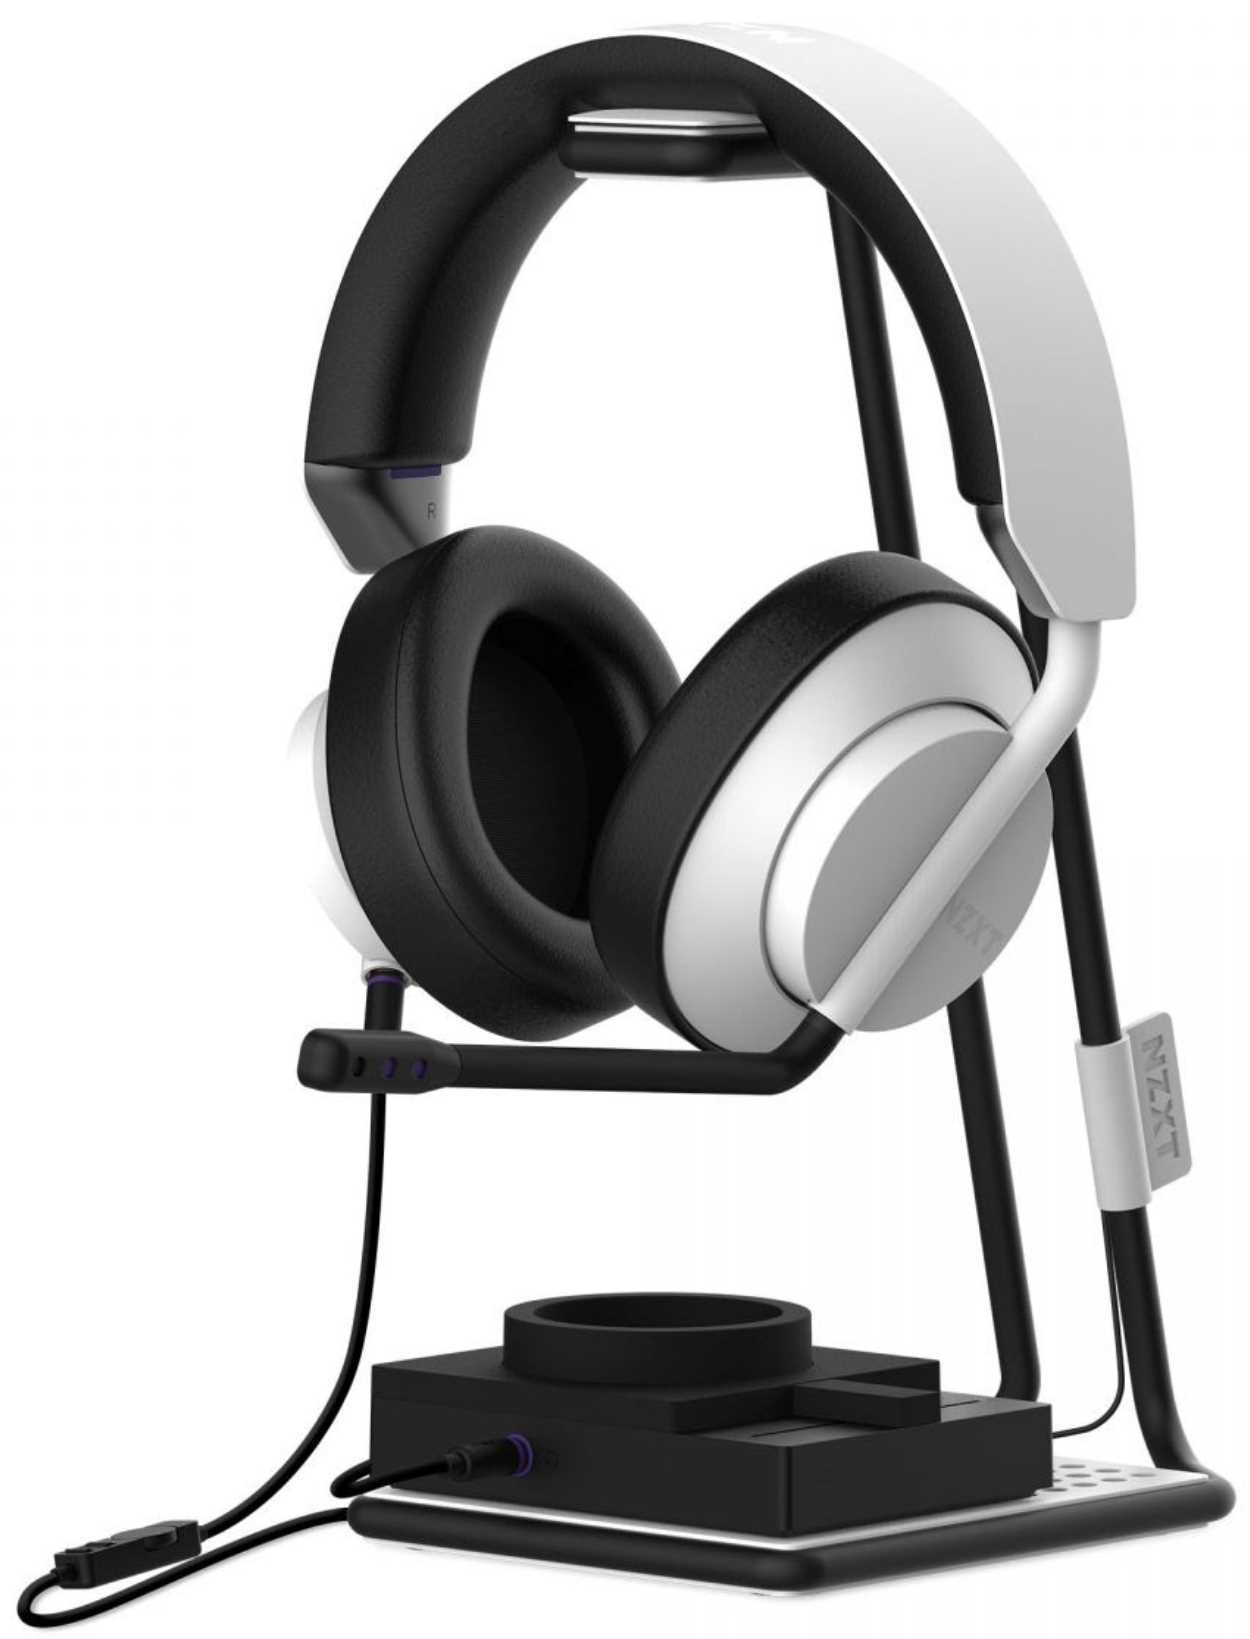 nzxt headset